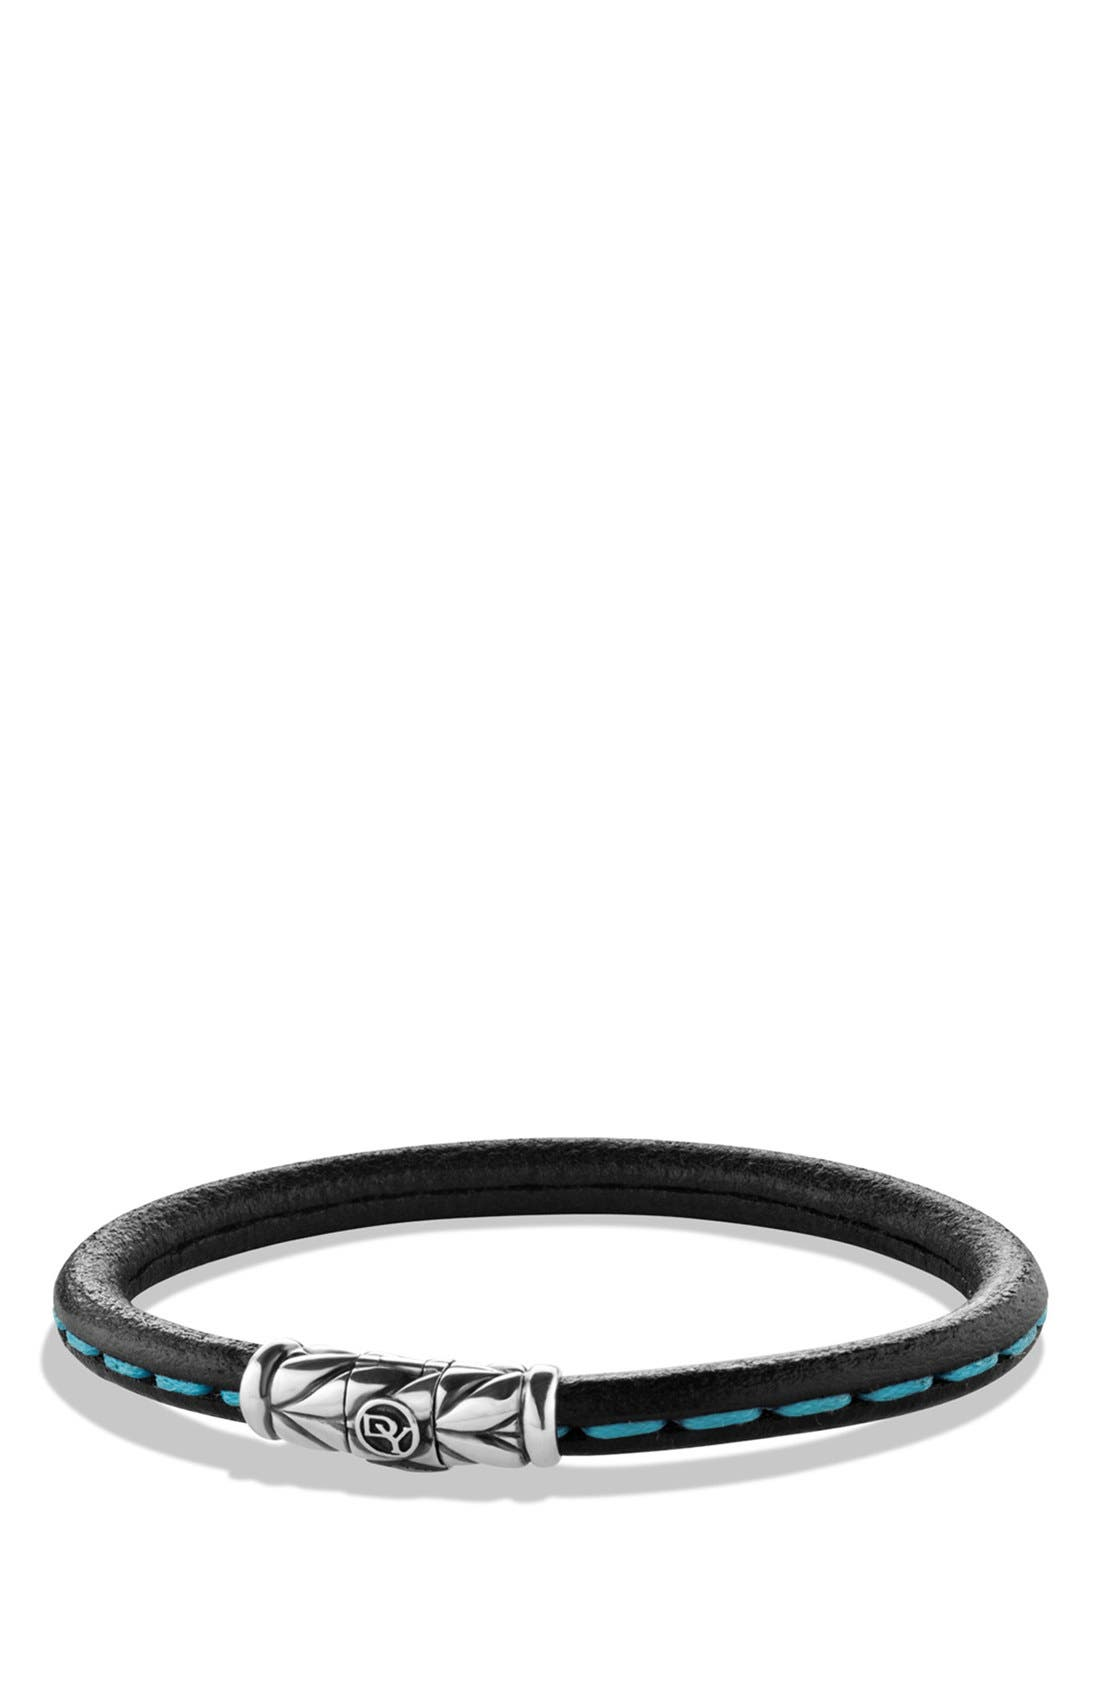 David Yurman 'Chevron' Leather Bracelet